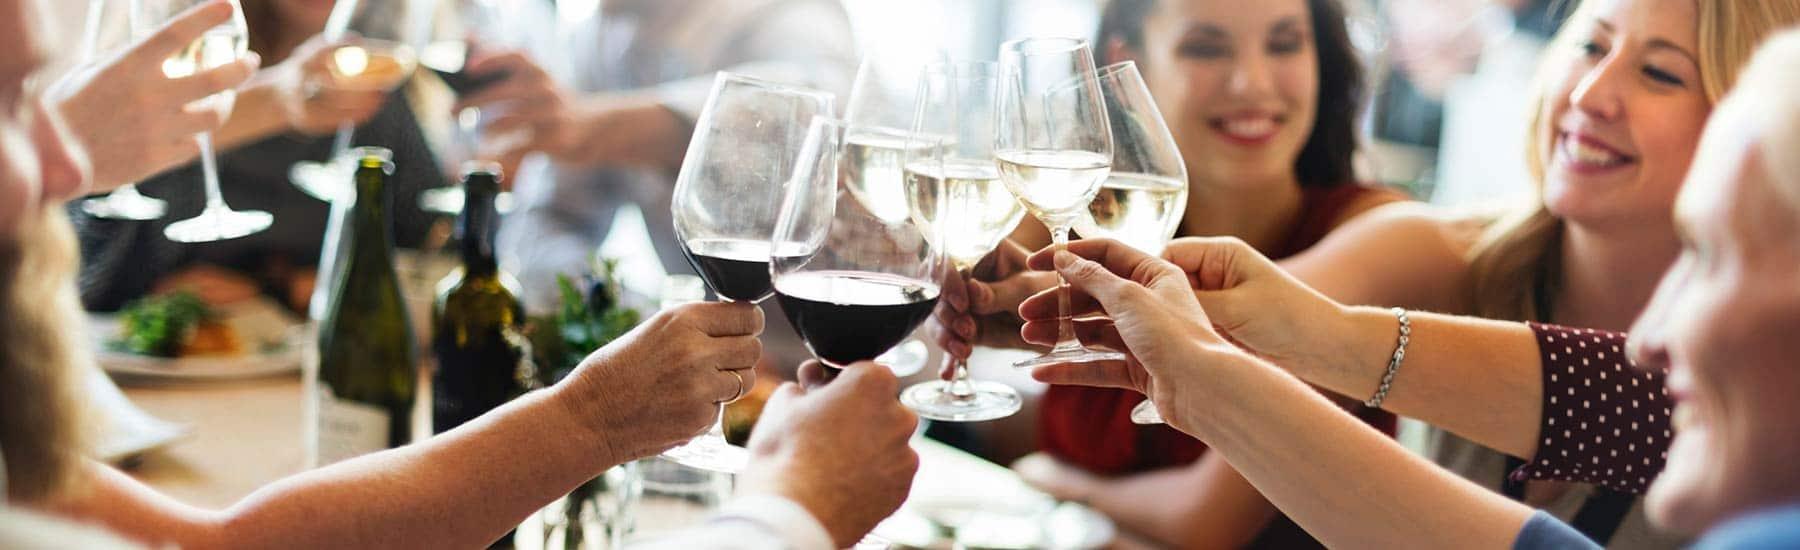 Group Cheering Wine